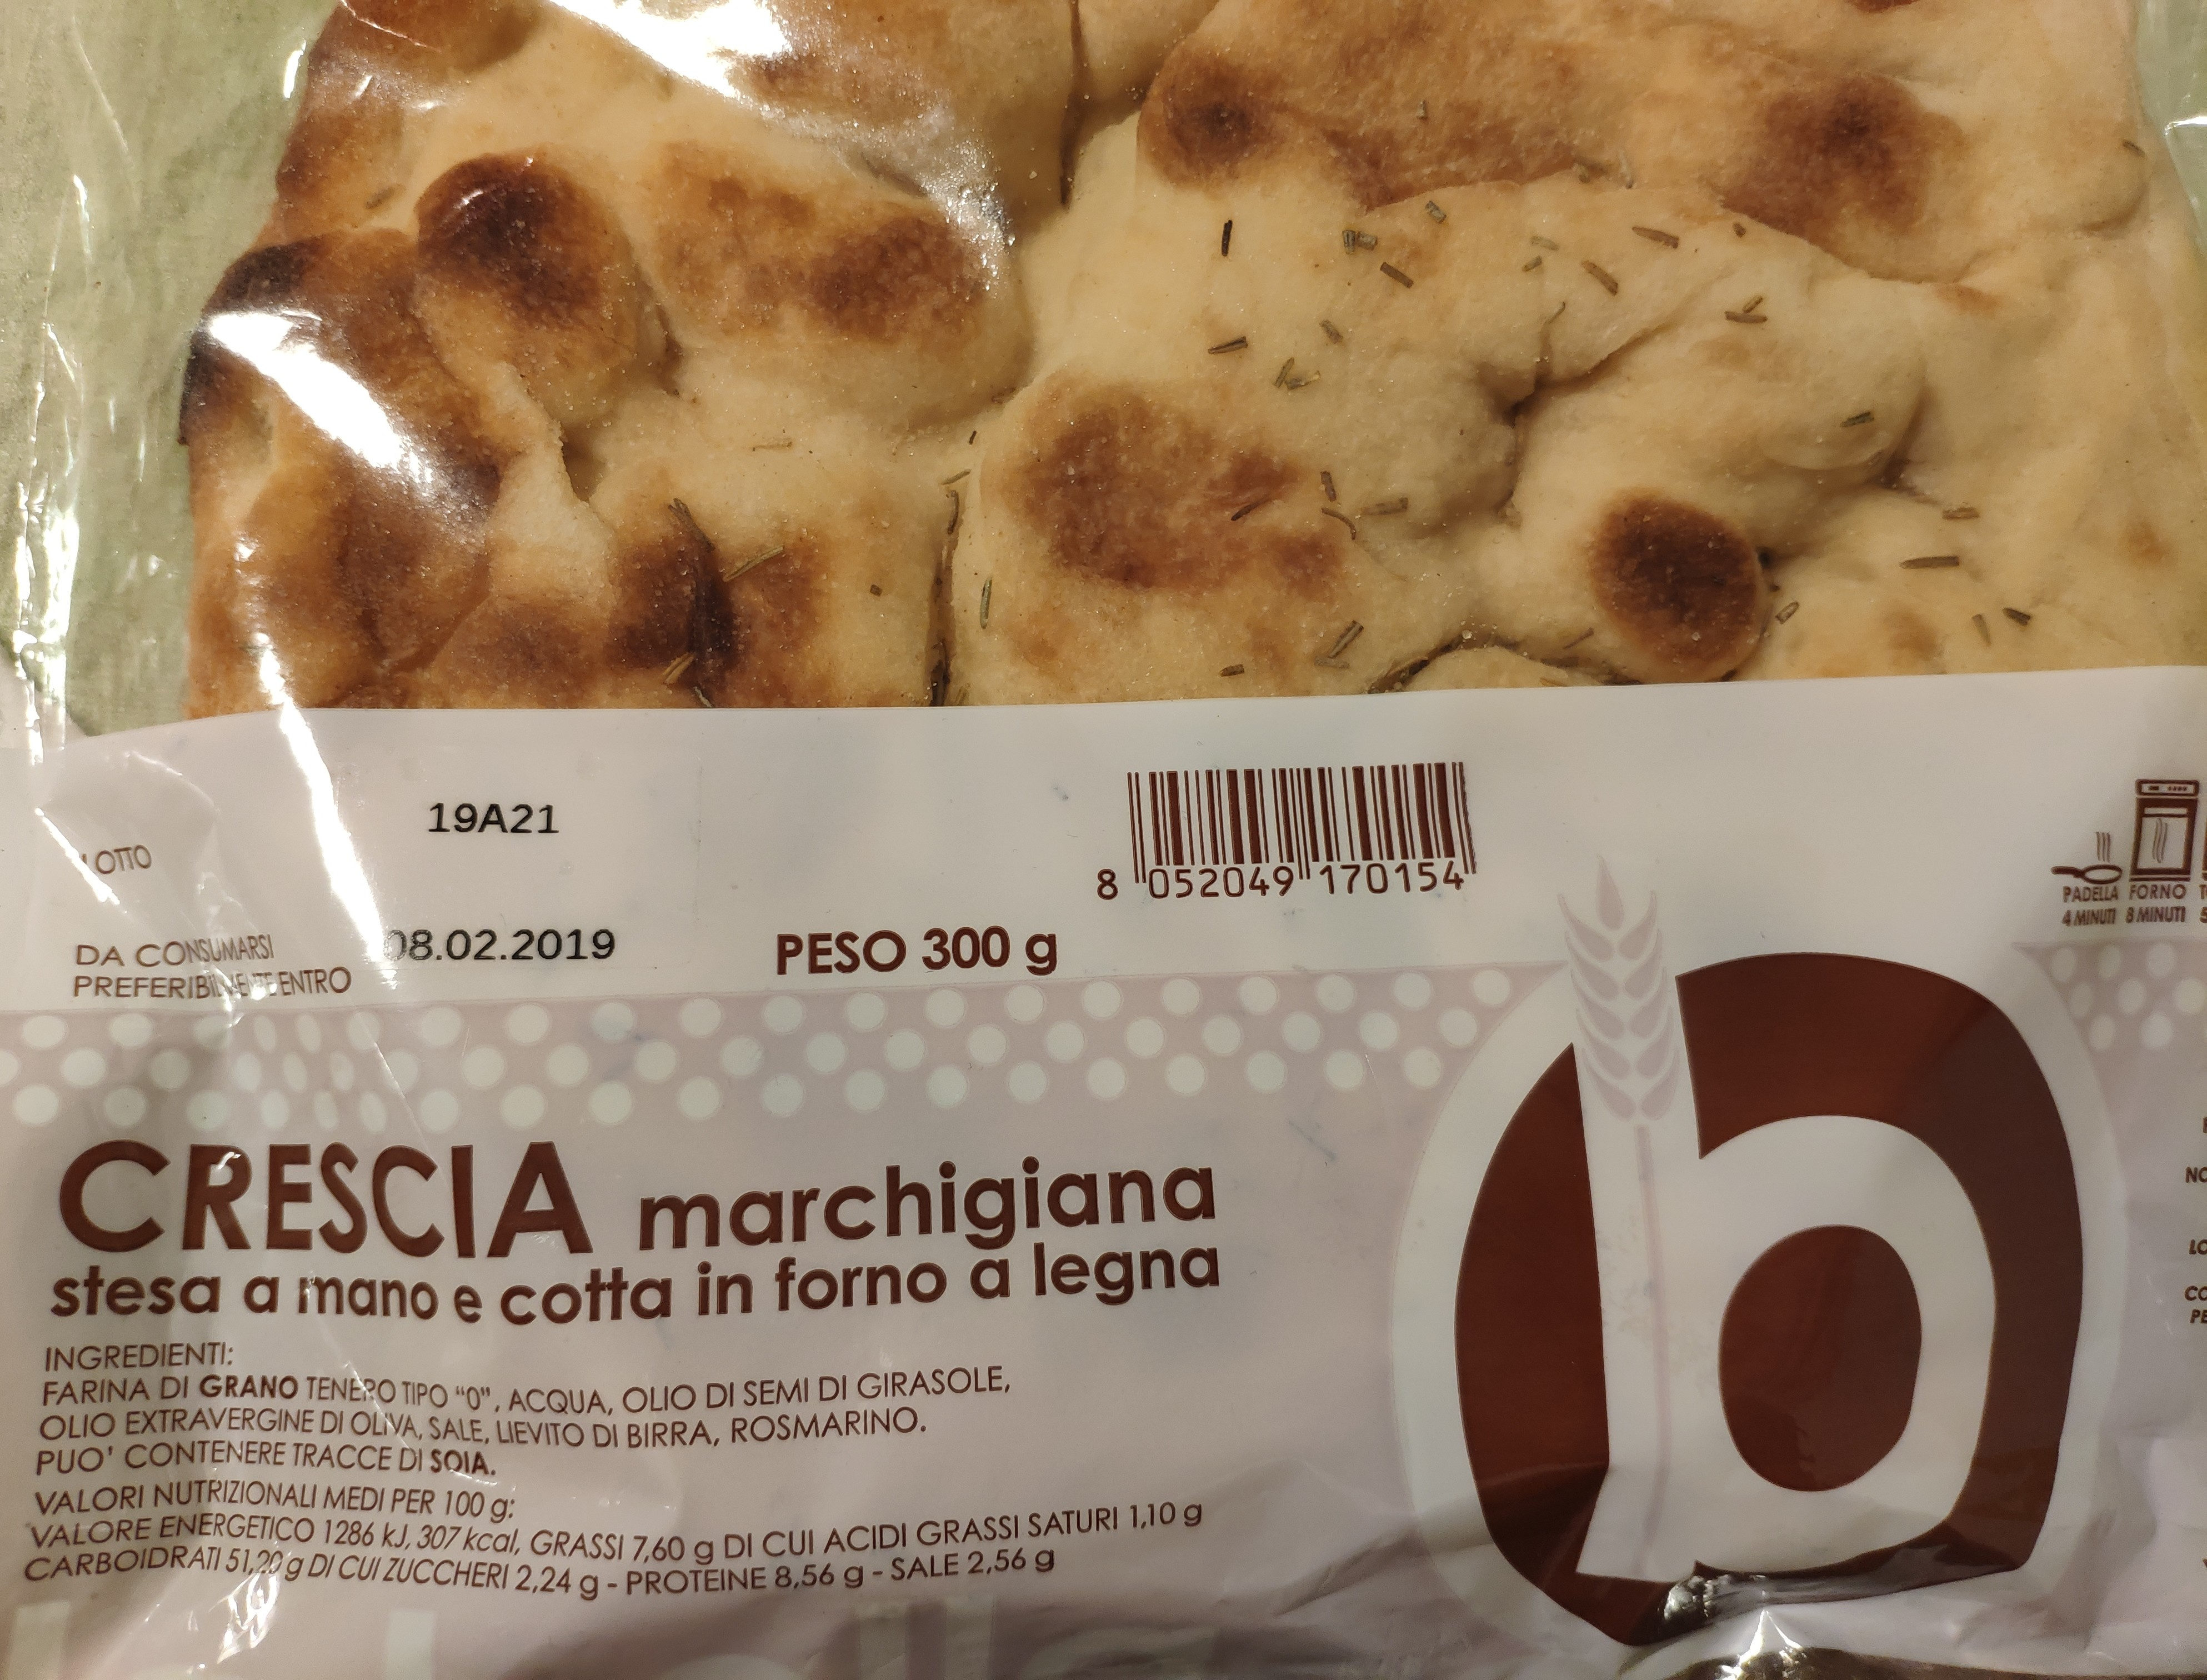 Crescia marchigiana - Product - it